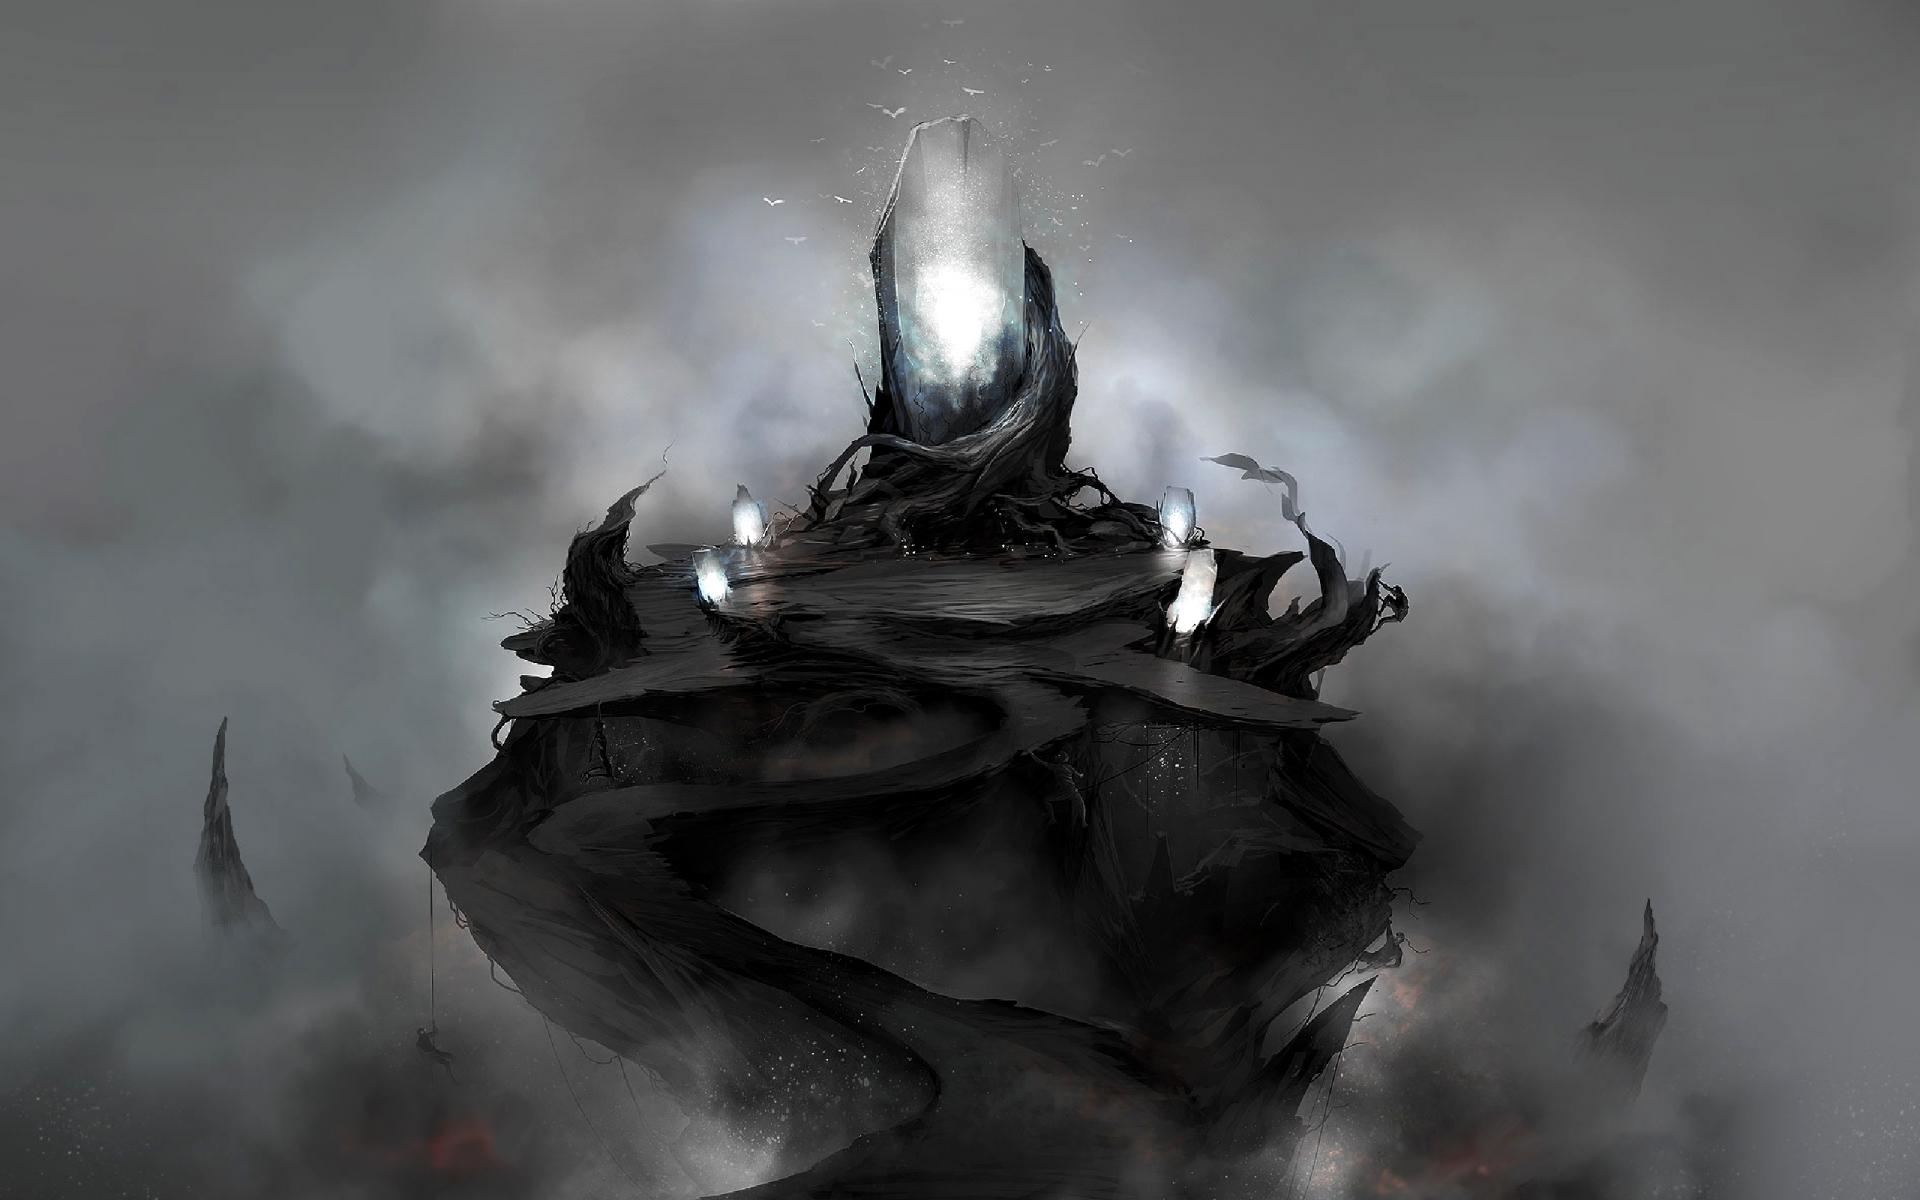 Fantasy dark magic art wallpaper | 1920x1200 | 29382 | WallpaperUP